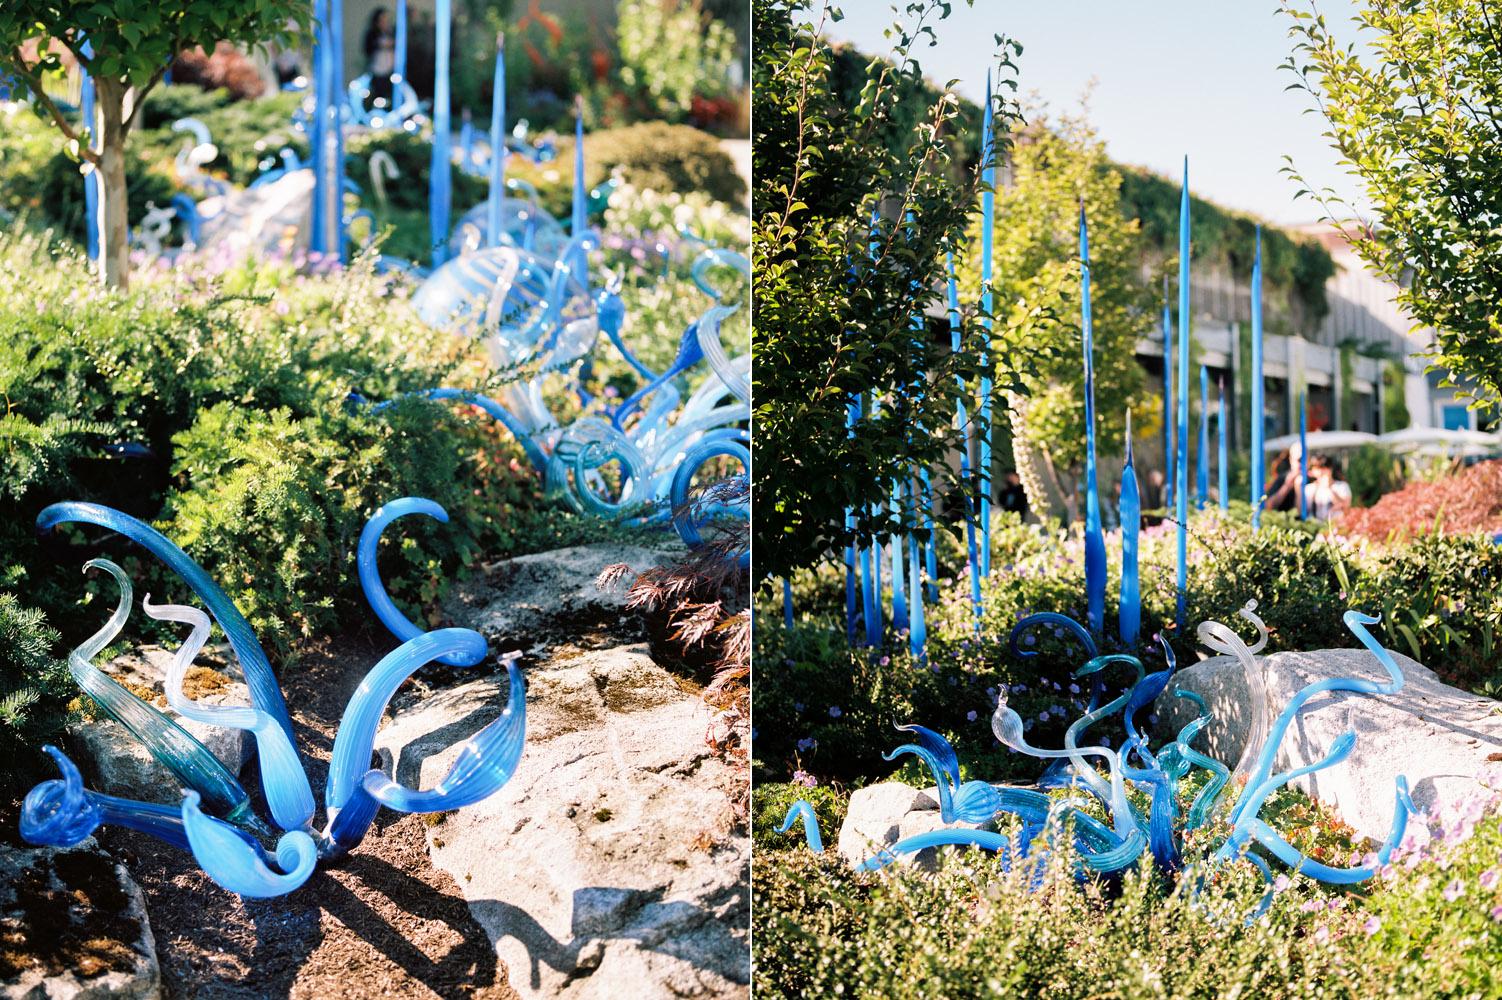 chihuly garden of glass 7.jpg